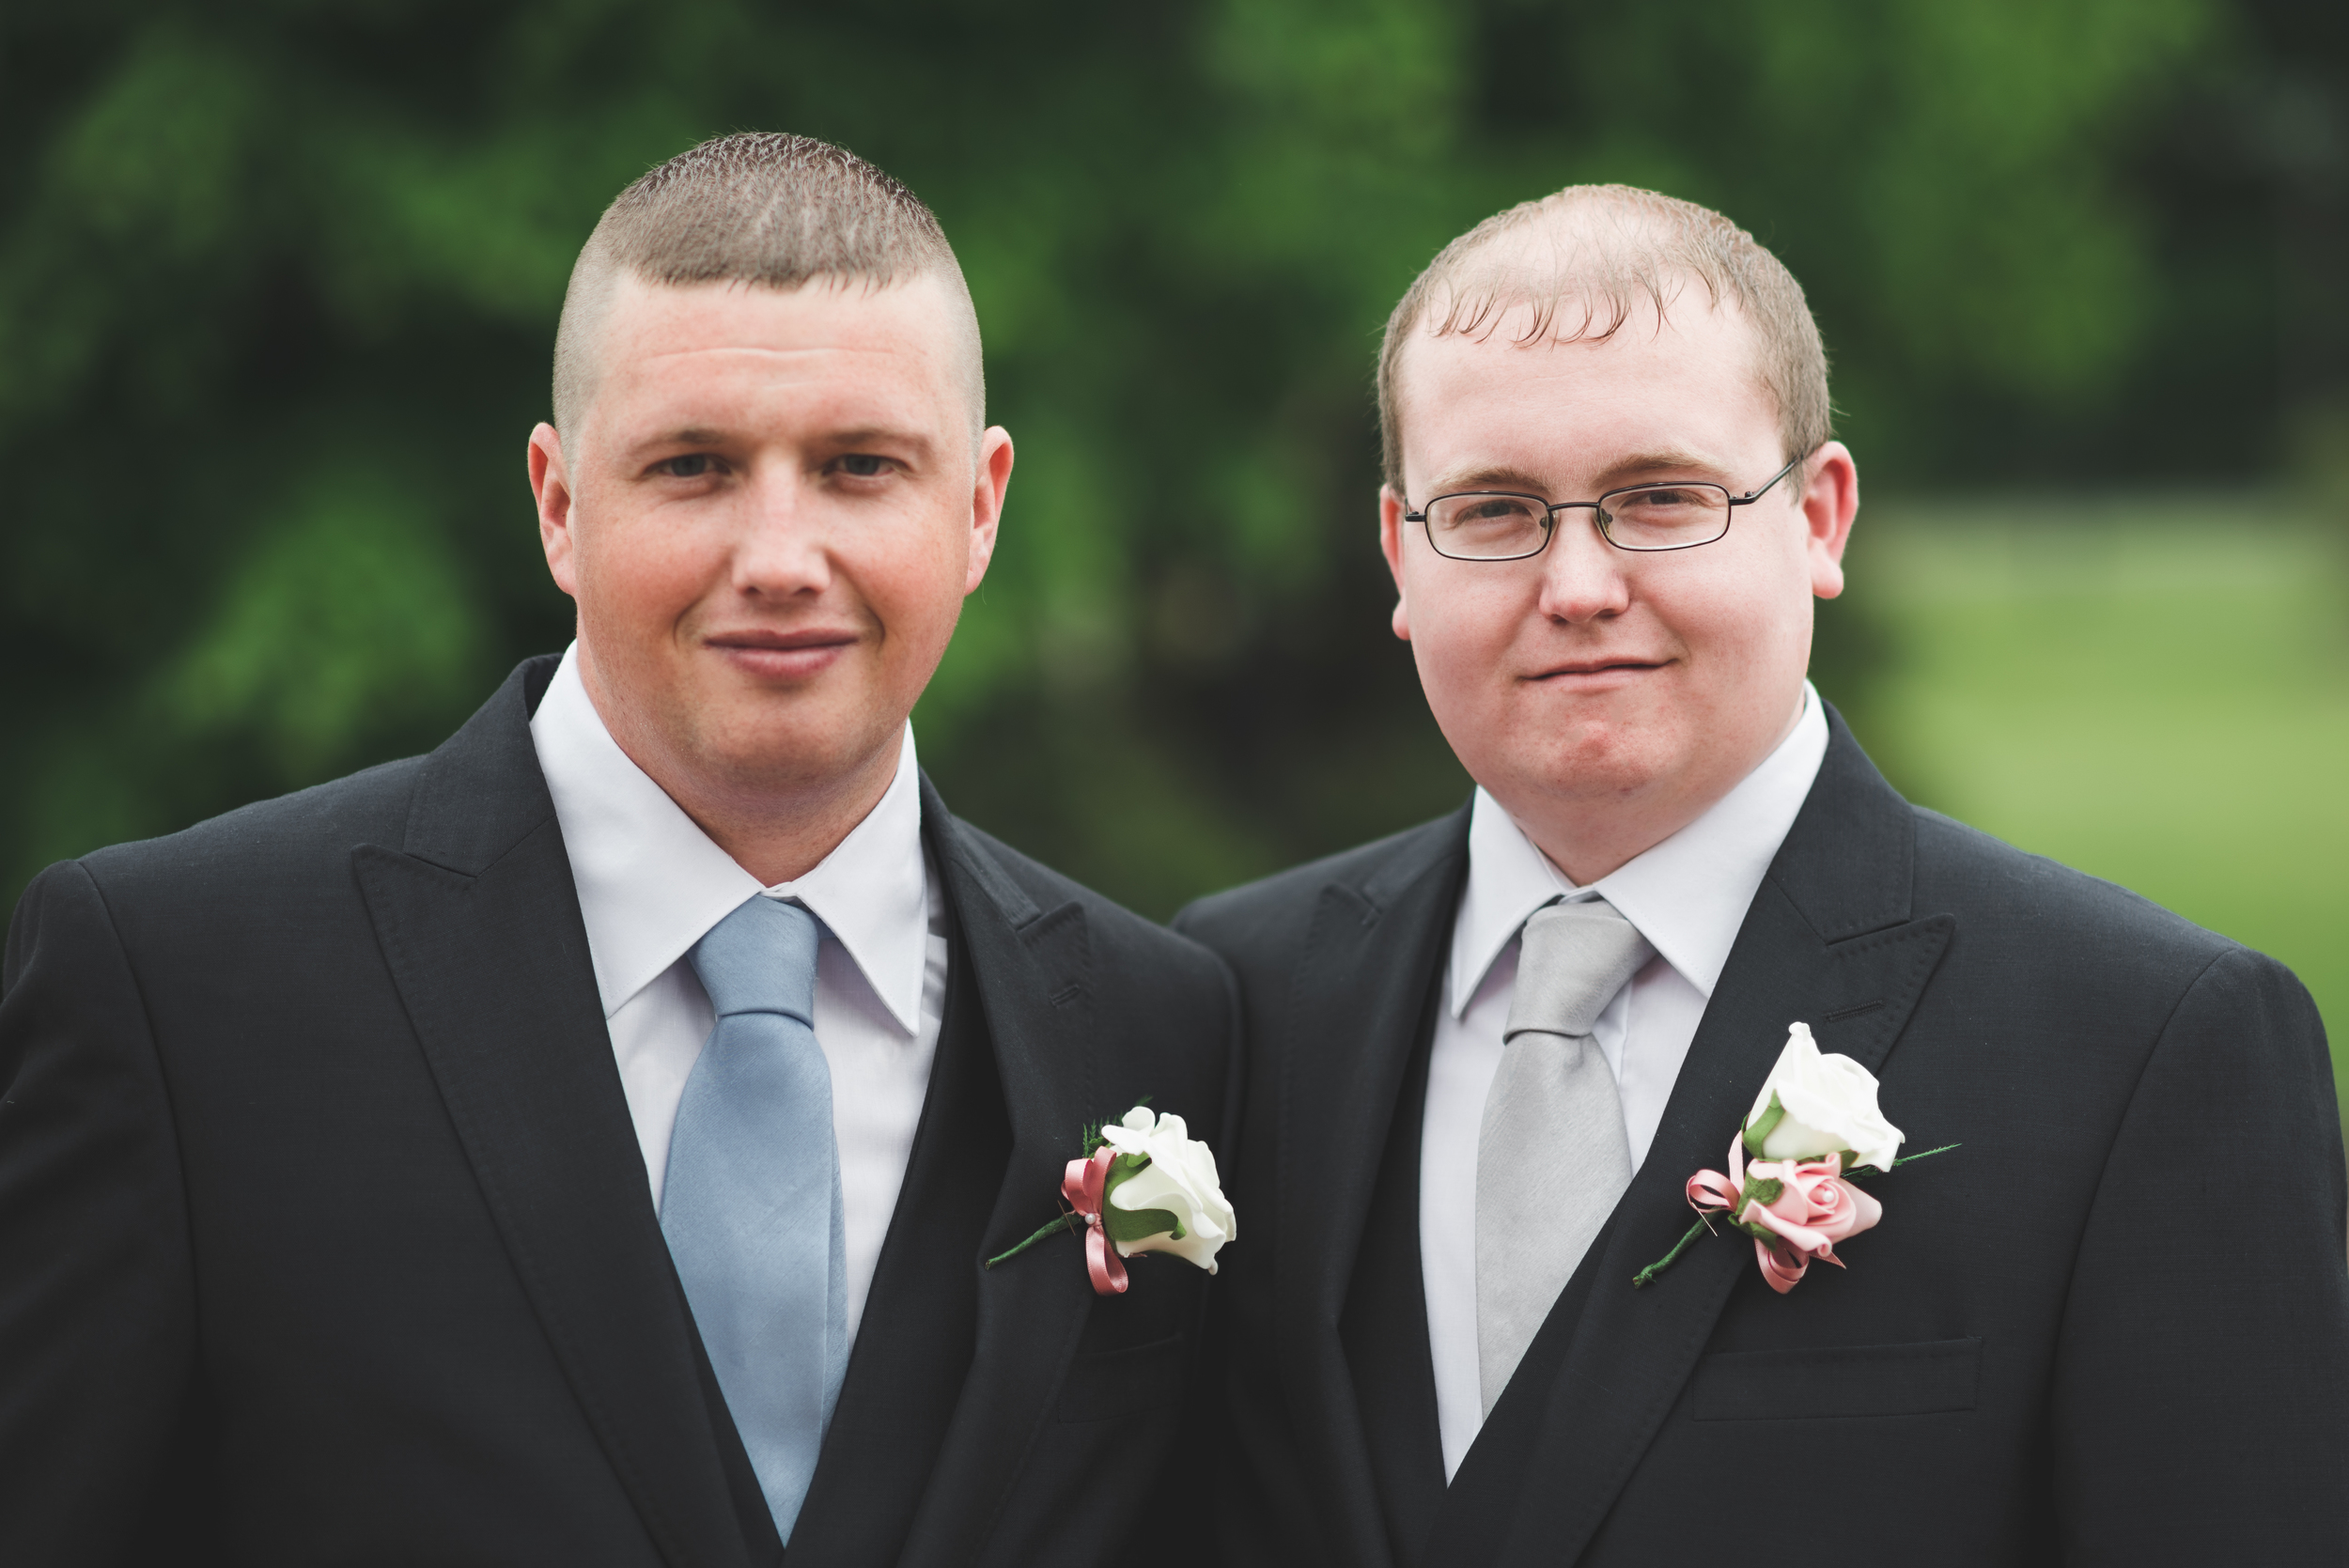 Ballymac_Hotel_Lisburn_Wedding_Groom_and_bestman